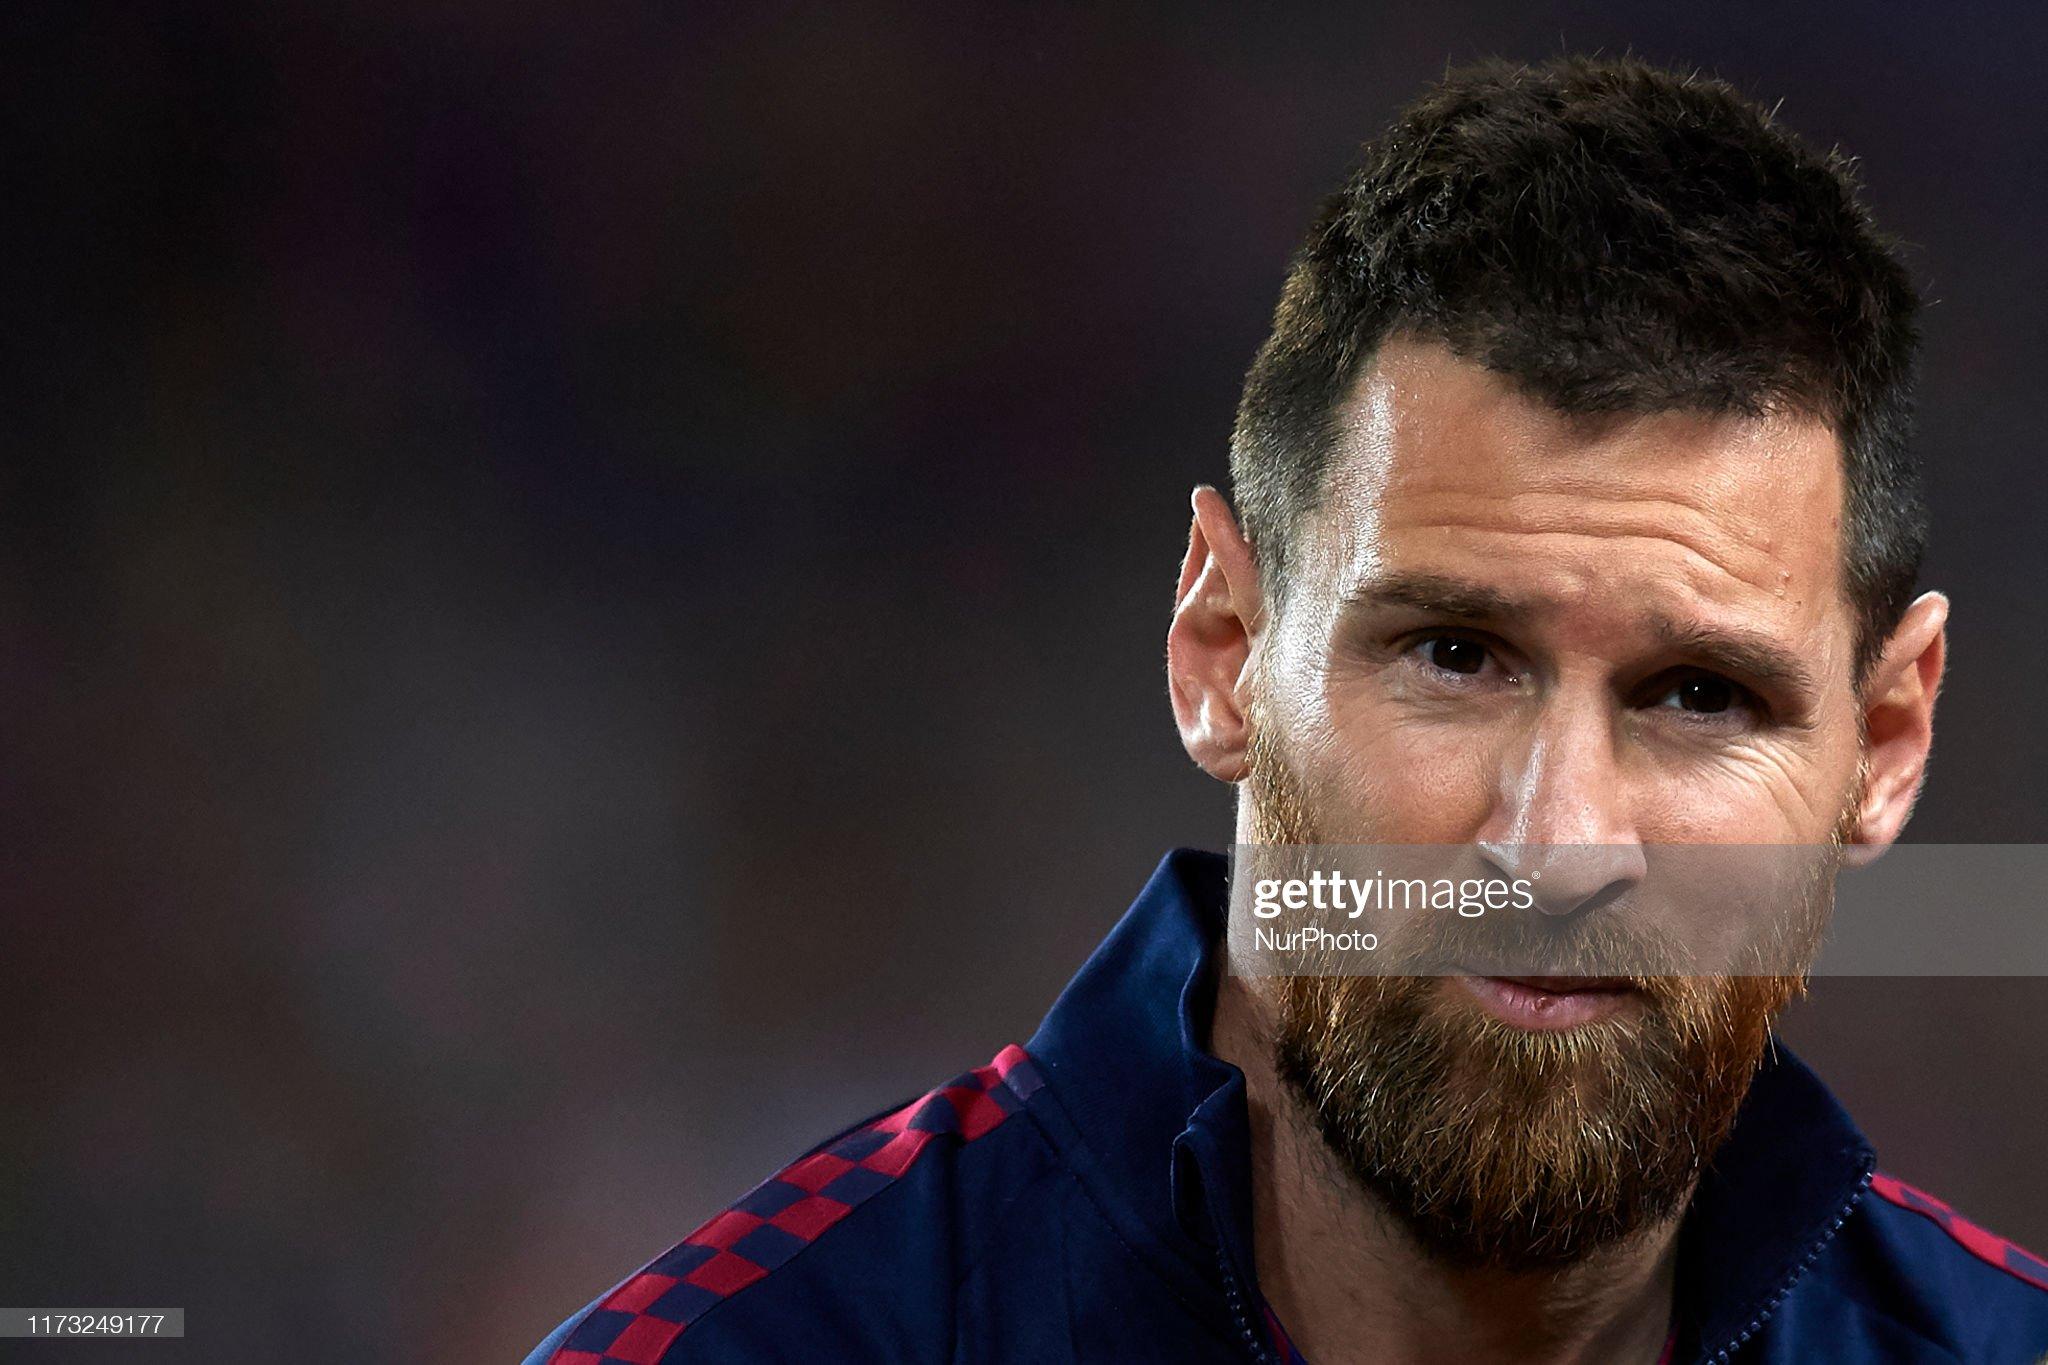 صور مباراة : برشلونة - إنتر 2-1 ( 02-10-2019 )  Lionel-messi-of-barcelona-during-the-uefa-champions-league-group-f-picture-id1173249177?s=2048x2048